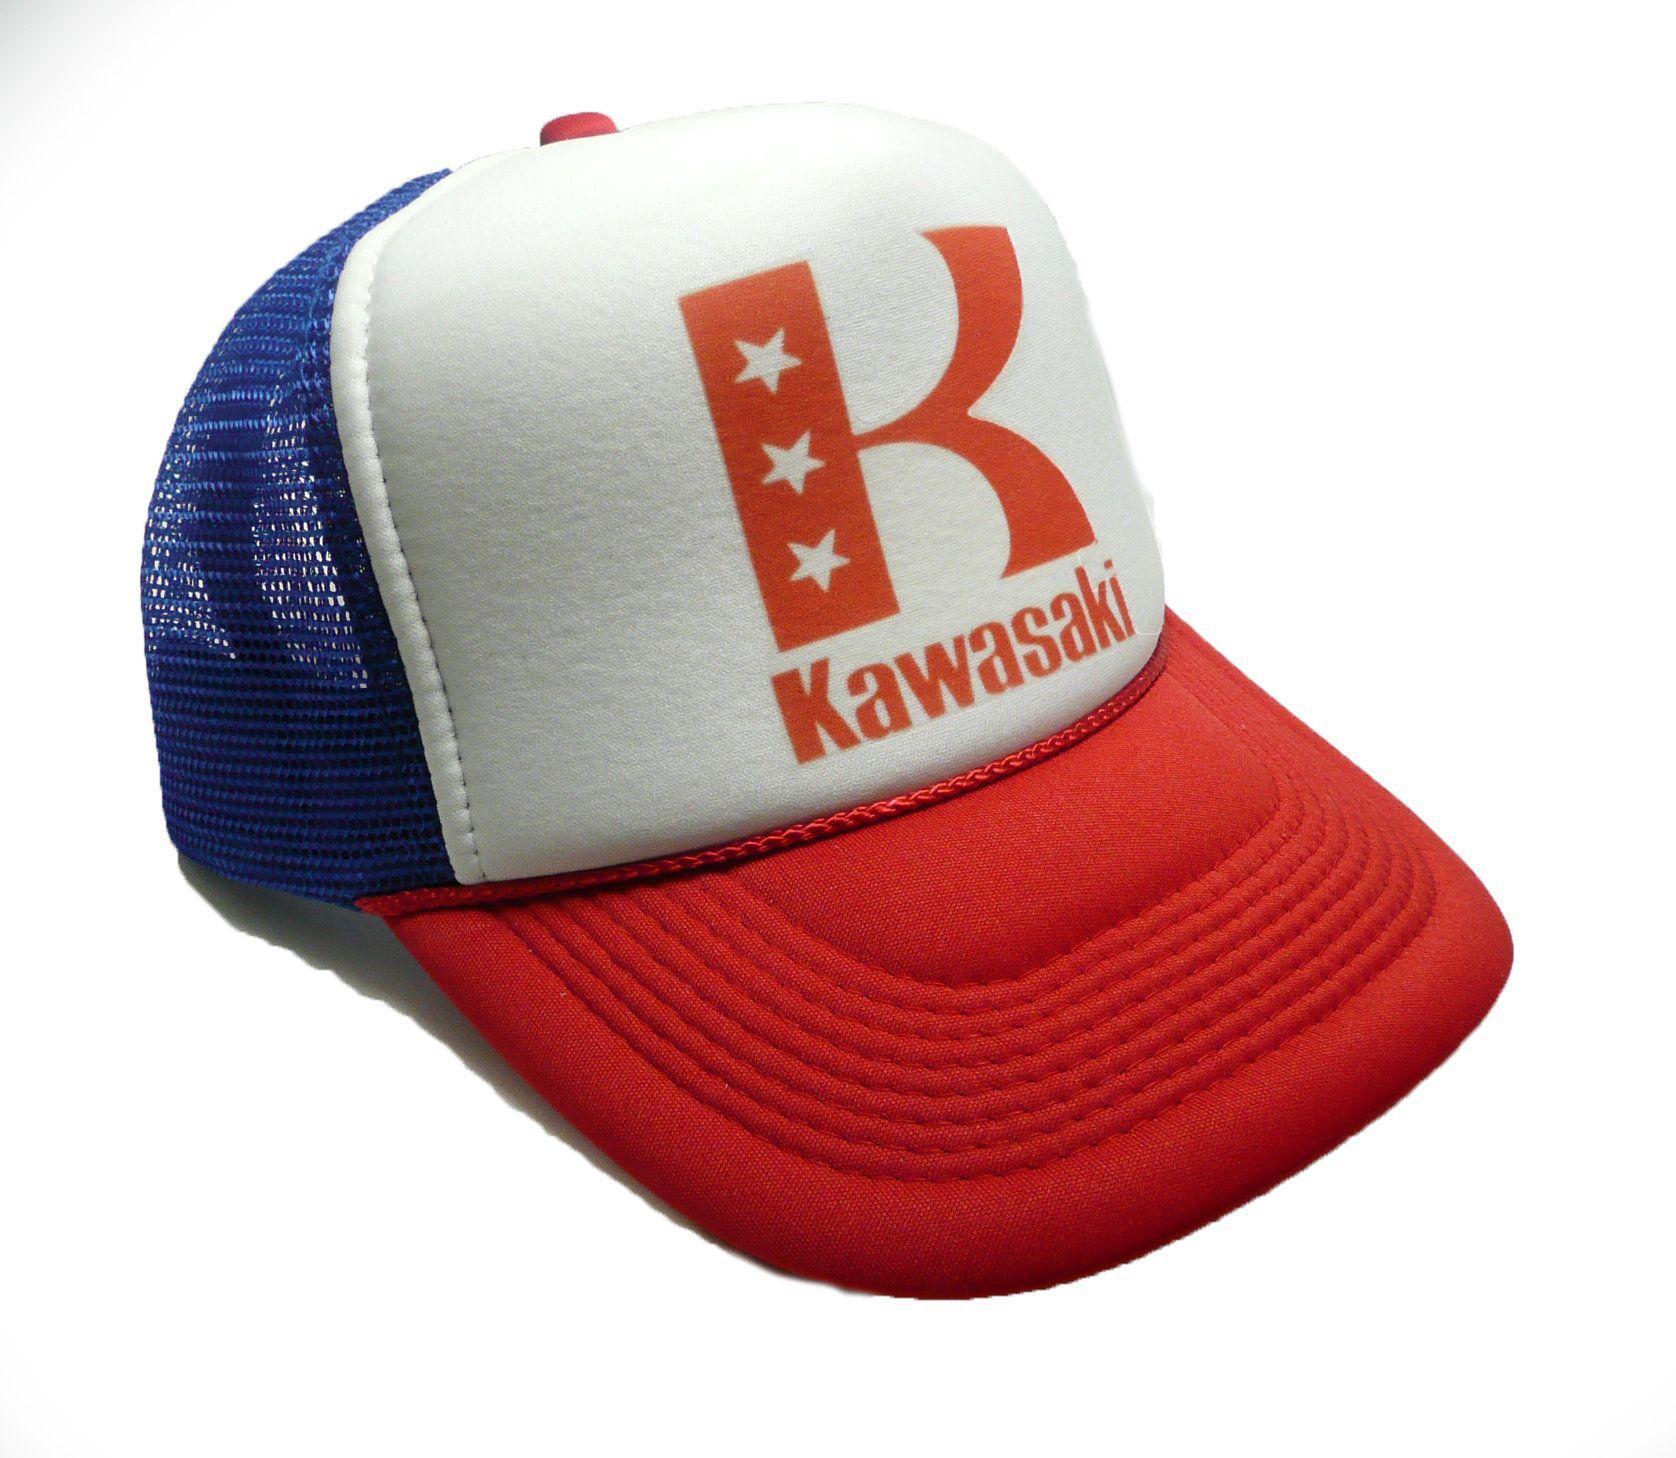 Vintage Kawasaki Motorcycles Hat Trucker Hat Adjustable Snap Etsy In 2021 Motorcycle Hat Vintage Trucker Hats Trucker Hat